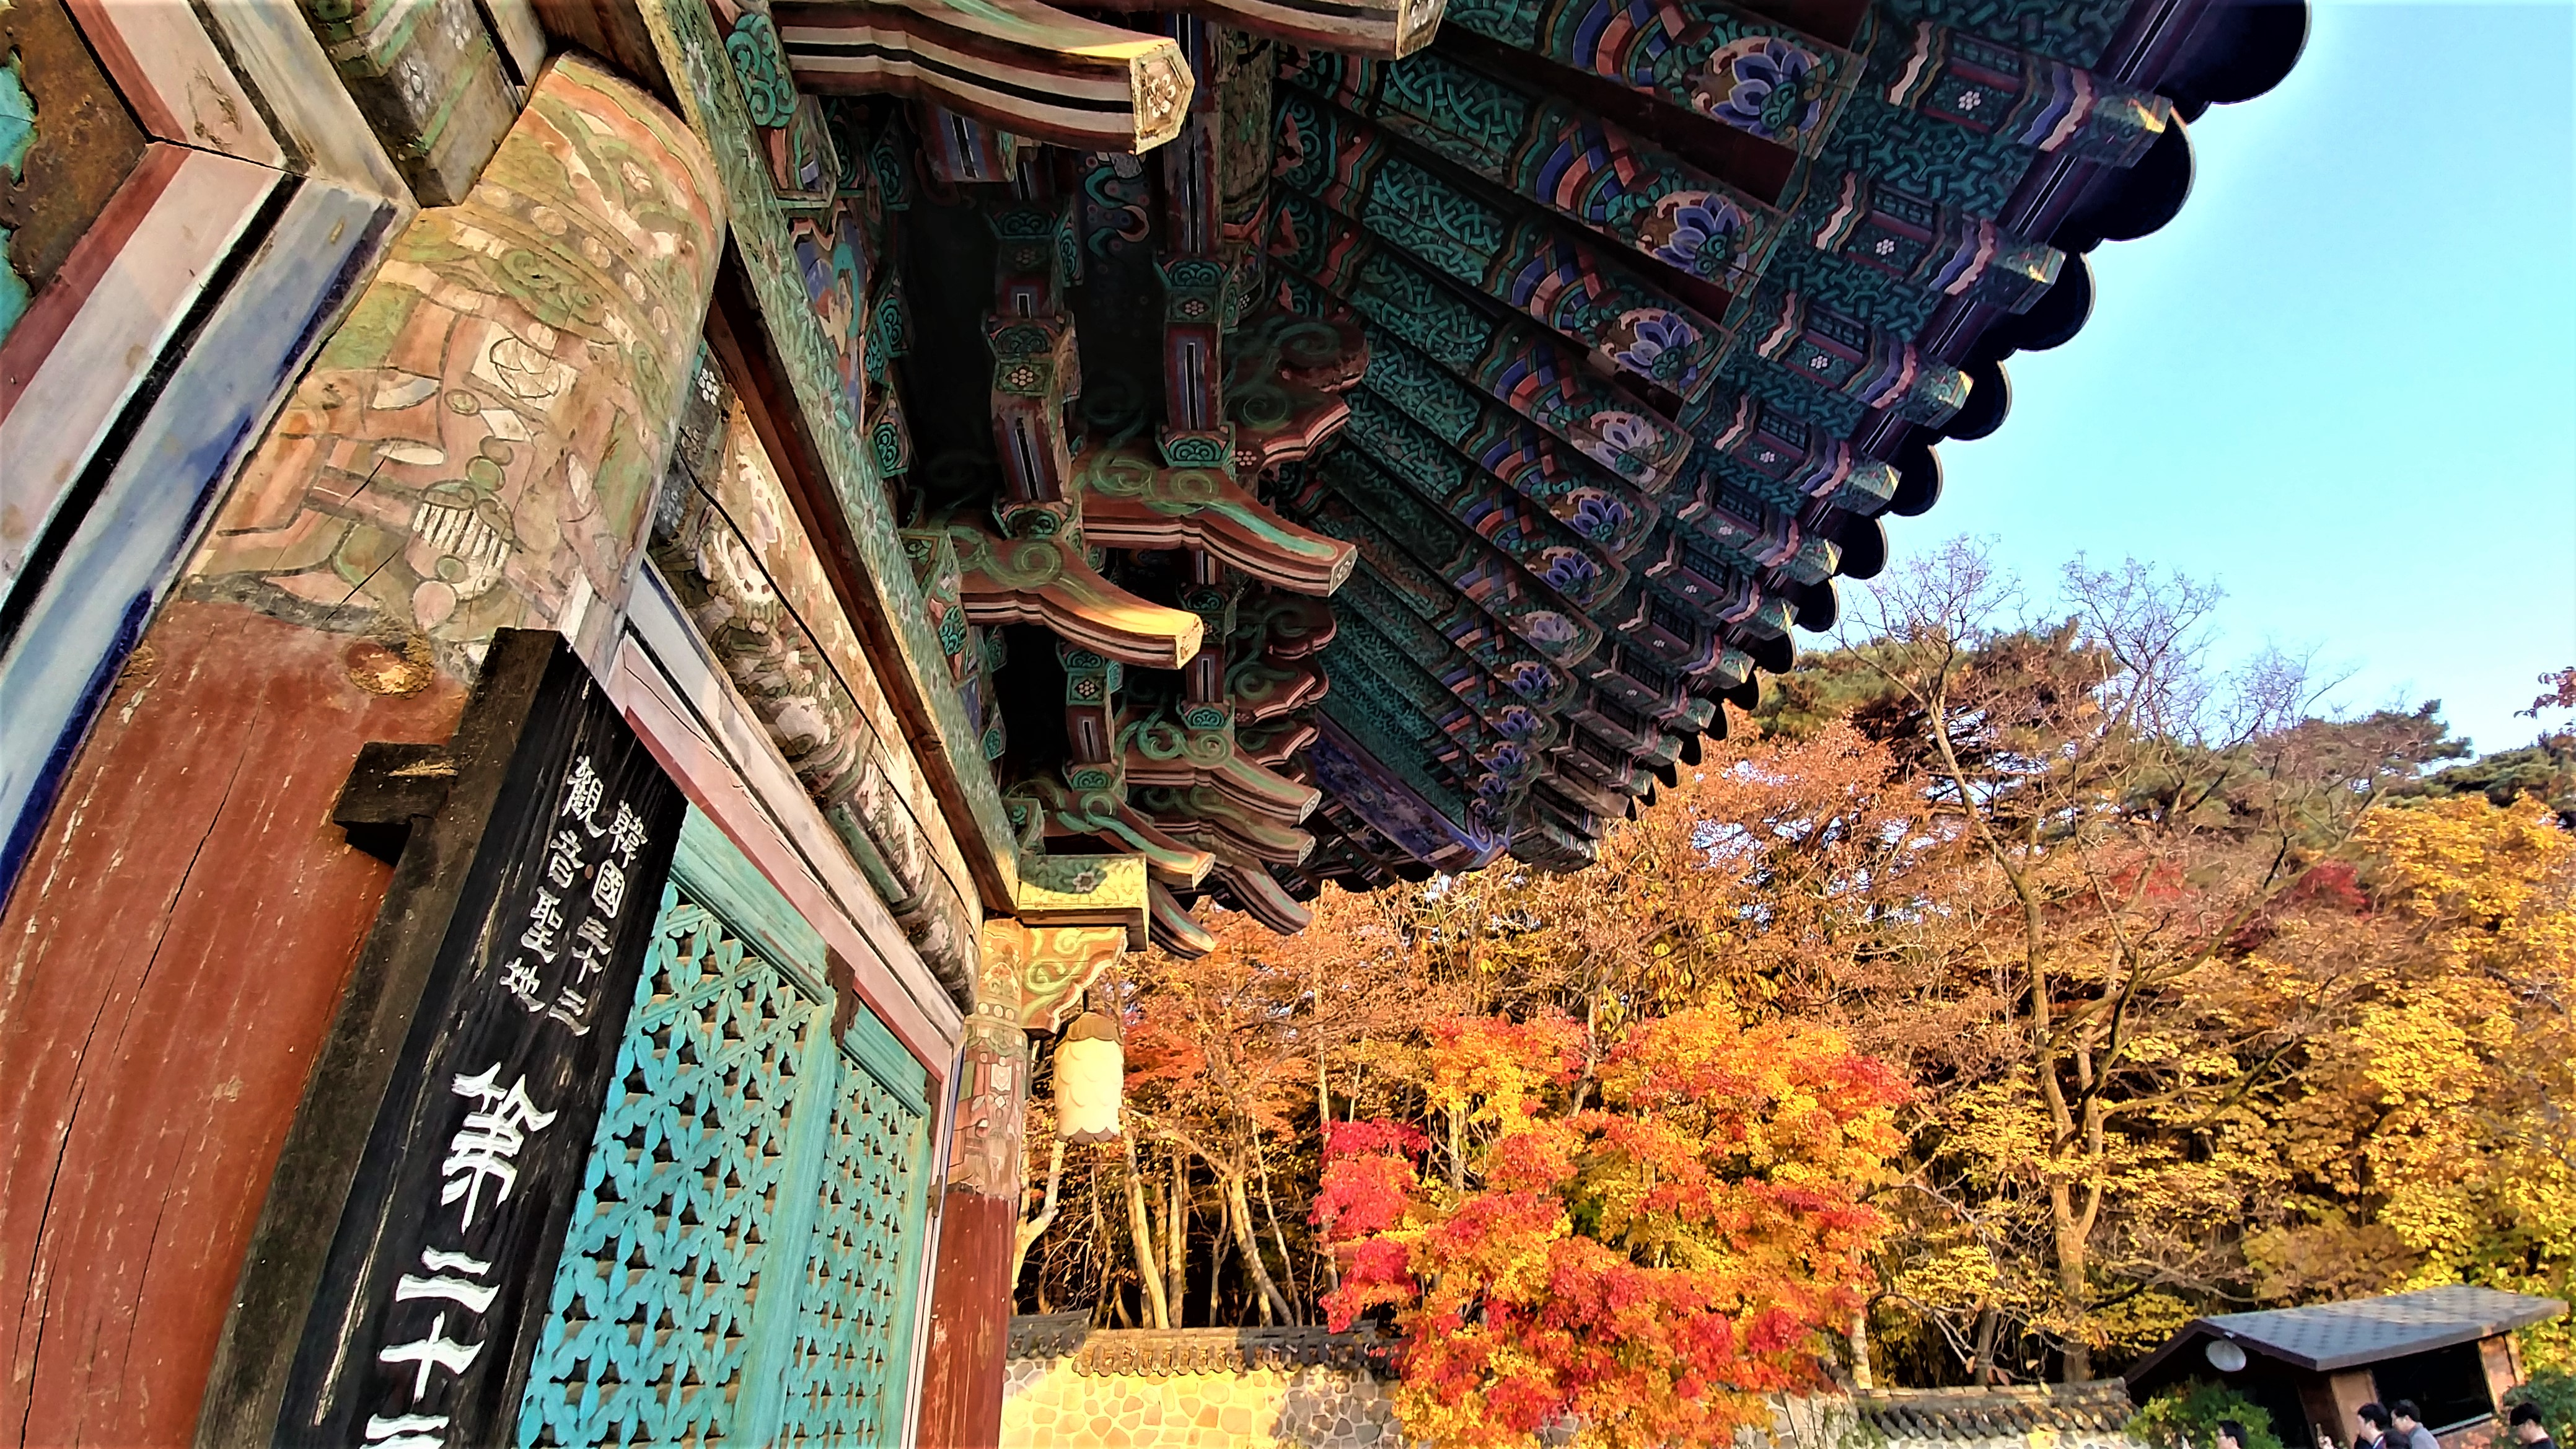 bulguksa templestay gyeongju seoul coree du sud blog voyage arpenter le chemin